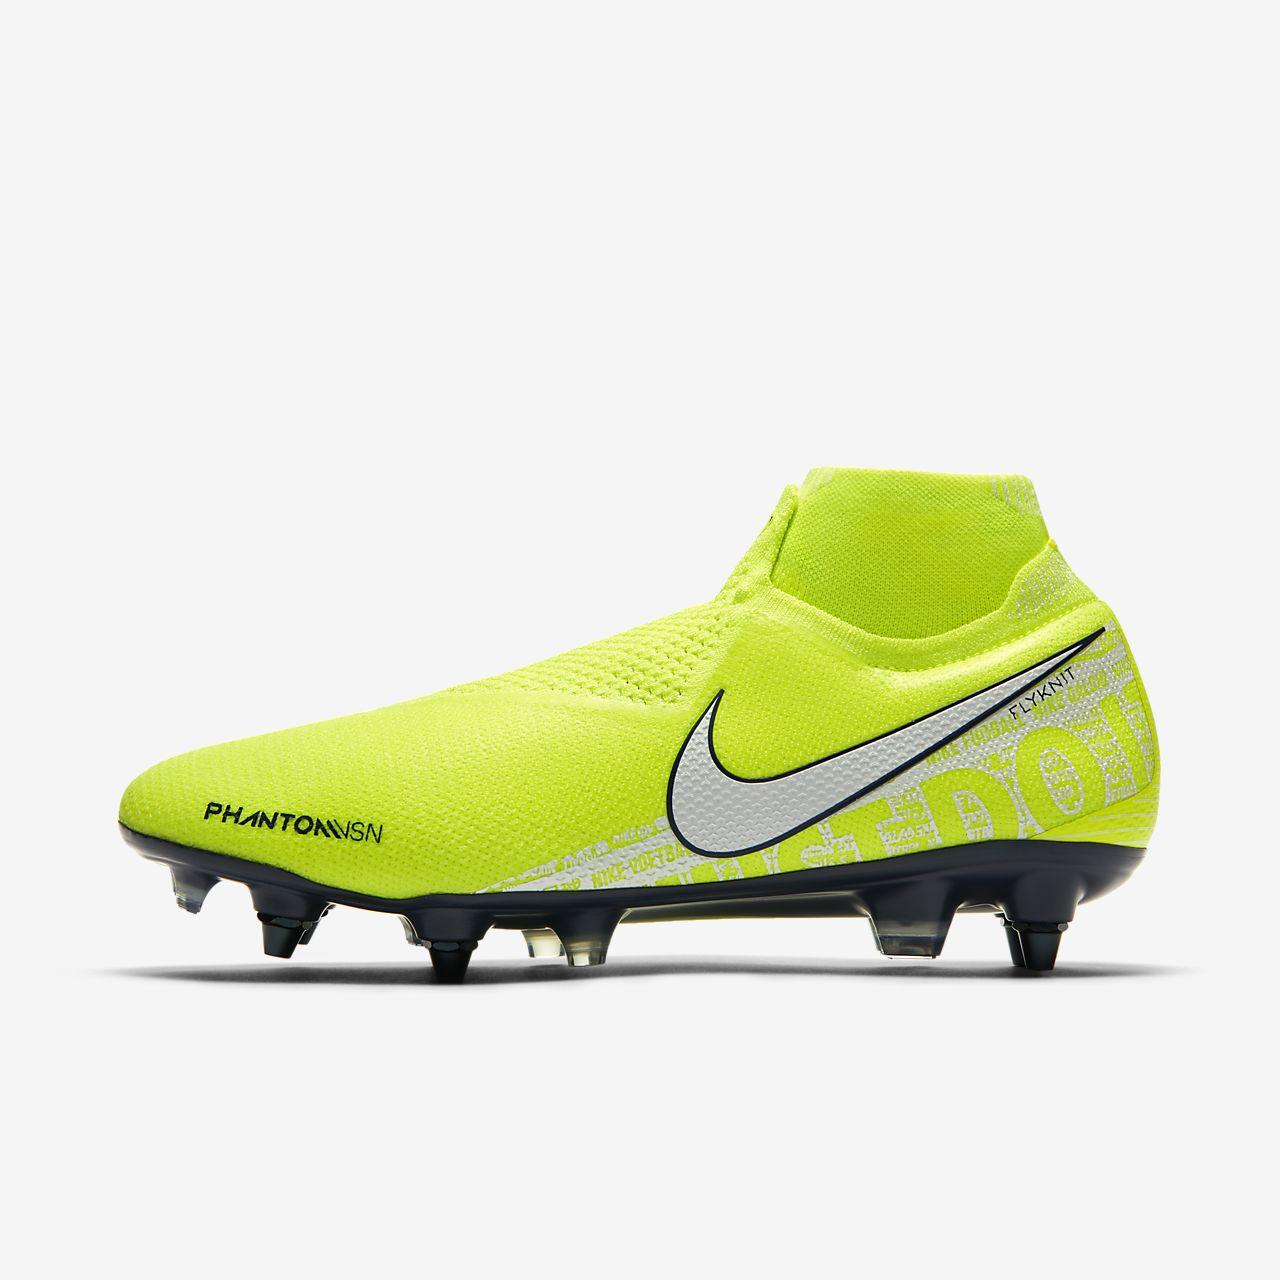 Calzado de fútbol Nike Phantom Vision Elite Dynamic Fit Anti-Clog SG-PRO